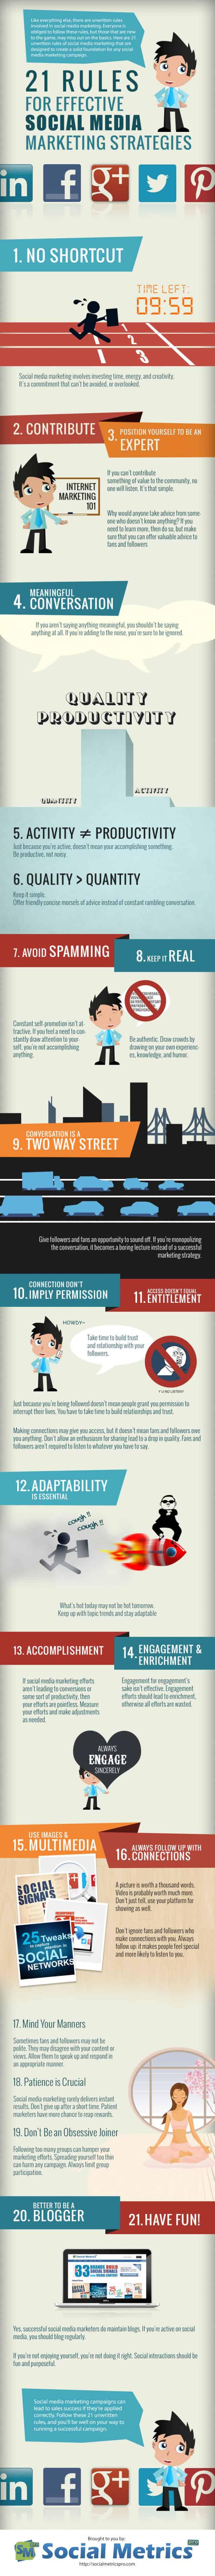 effective-social-media-strategies-infographic-640x7656